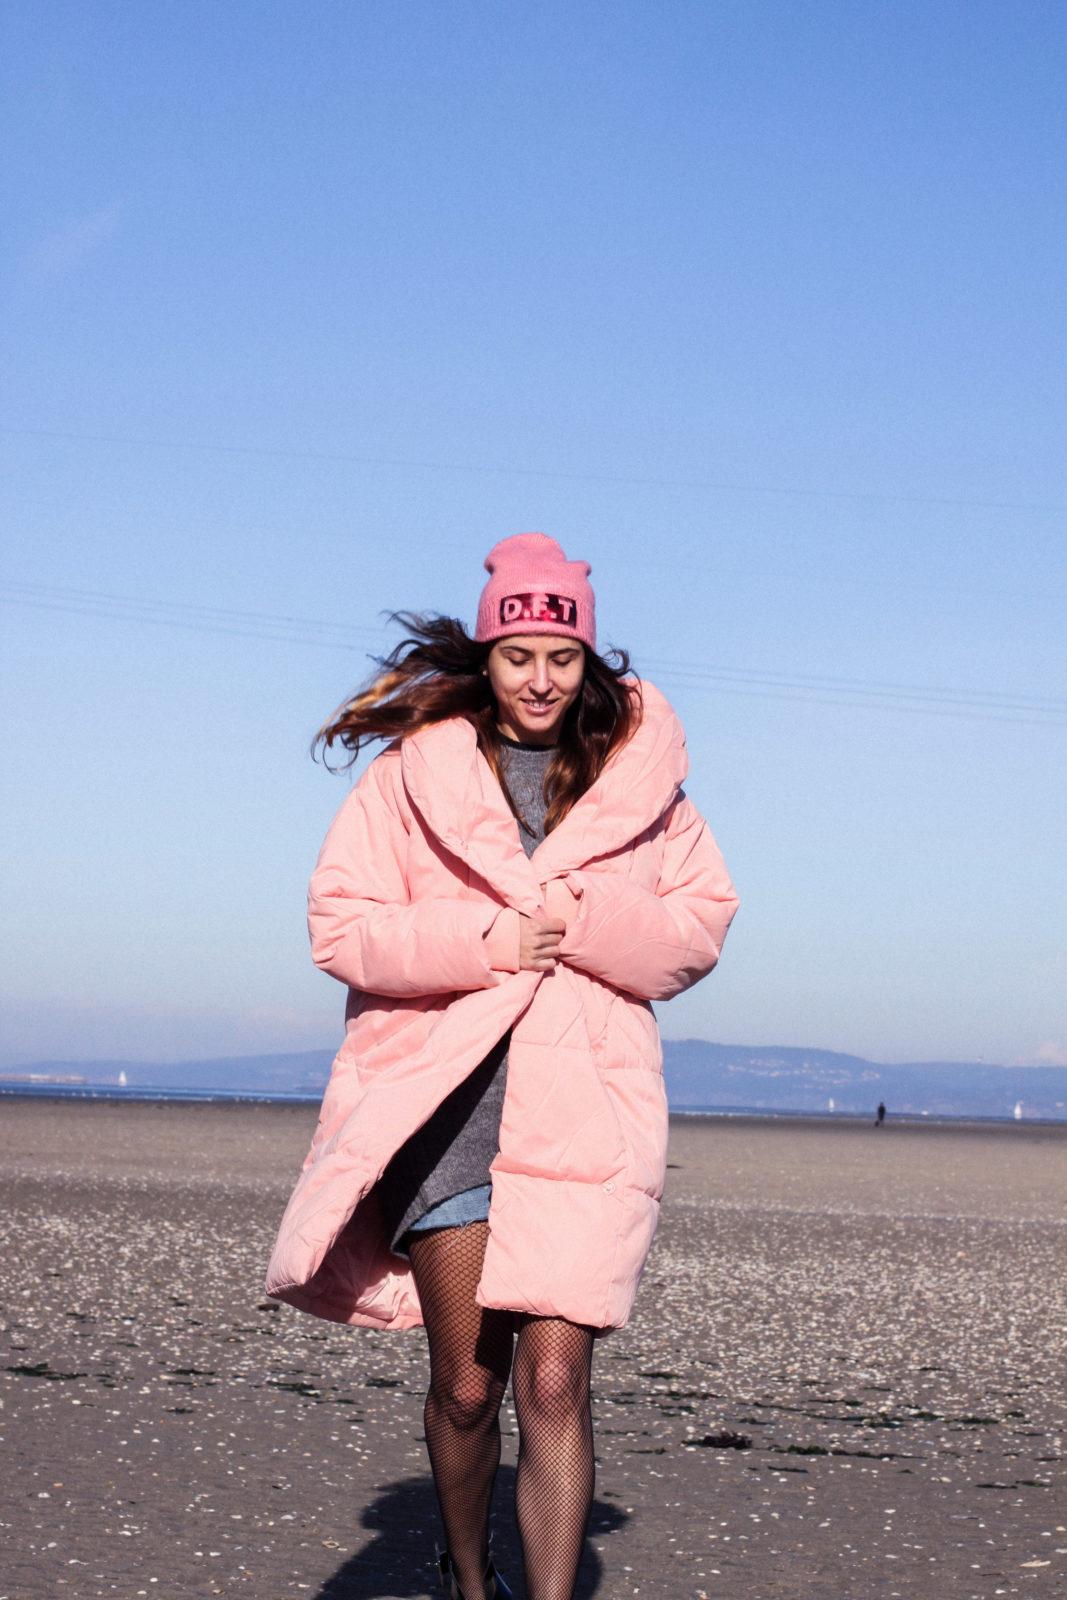 retailmenot-cupones-descuentos-asos-plumifero_rosa-monki-puffer_coat-gorro-beanie-medias_de_rejilla-look-outfit-tendencias-fall-2016-street_style-donkeycool-40